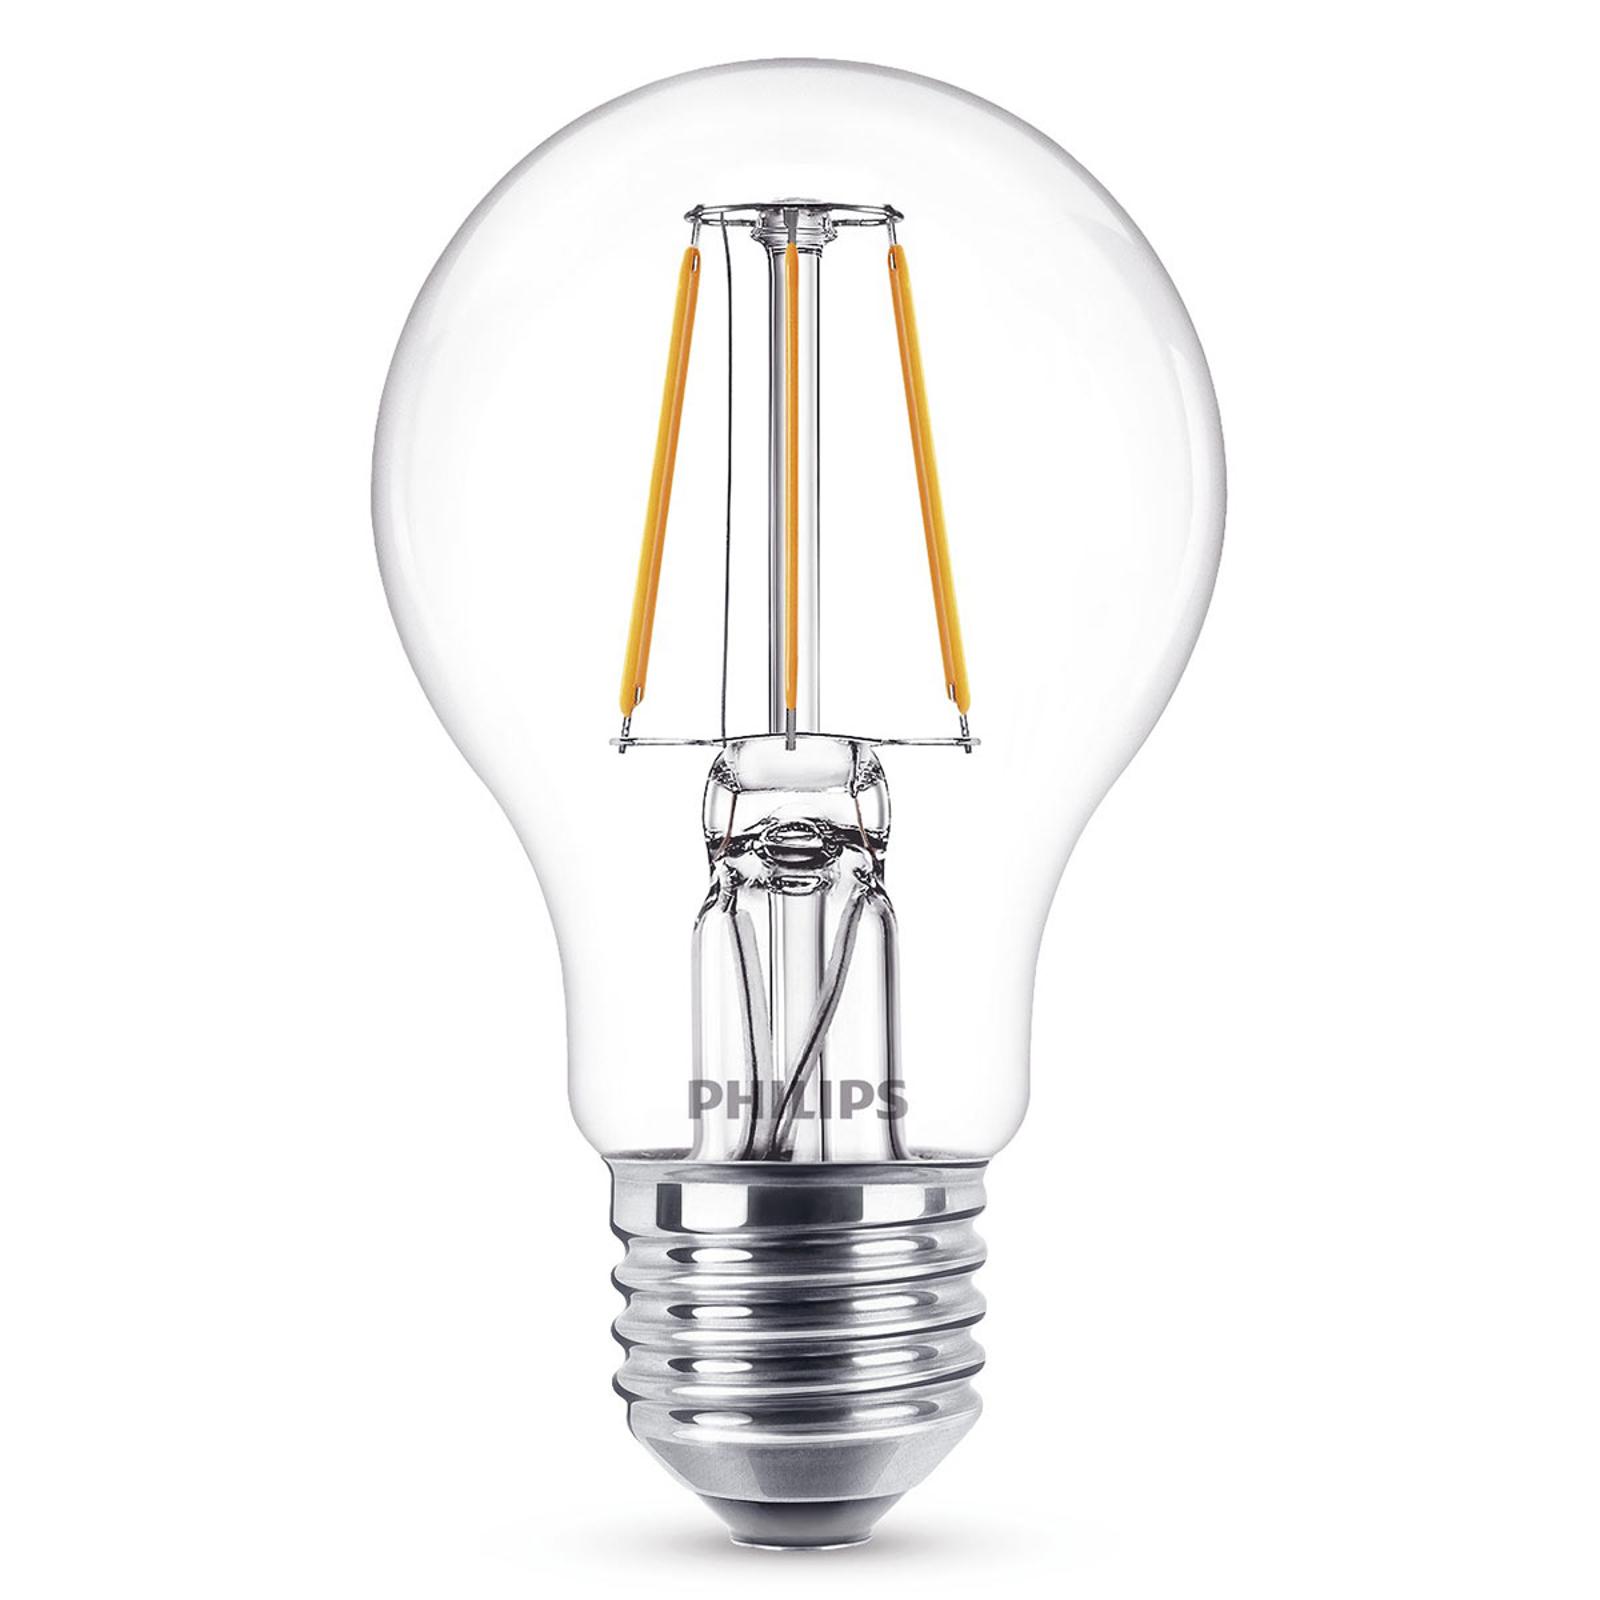 Philips E27 A60 LED-Lampe Filament 4 W 2.700K klar